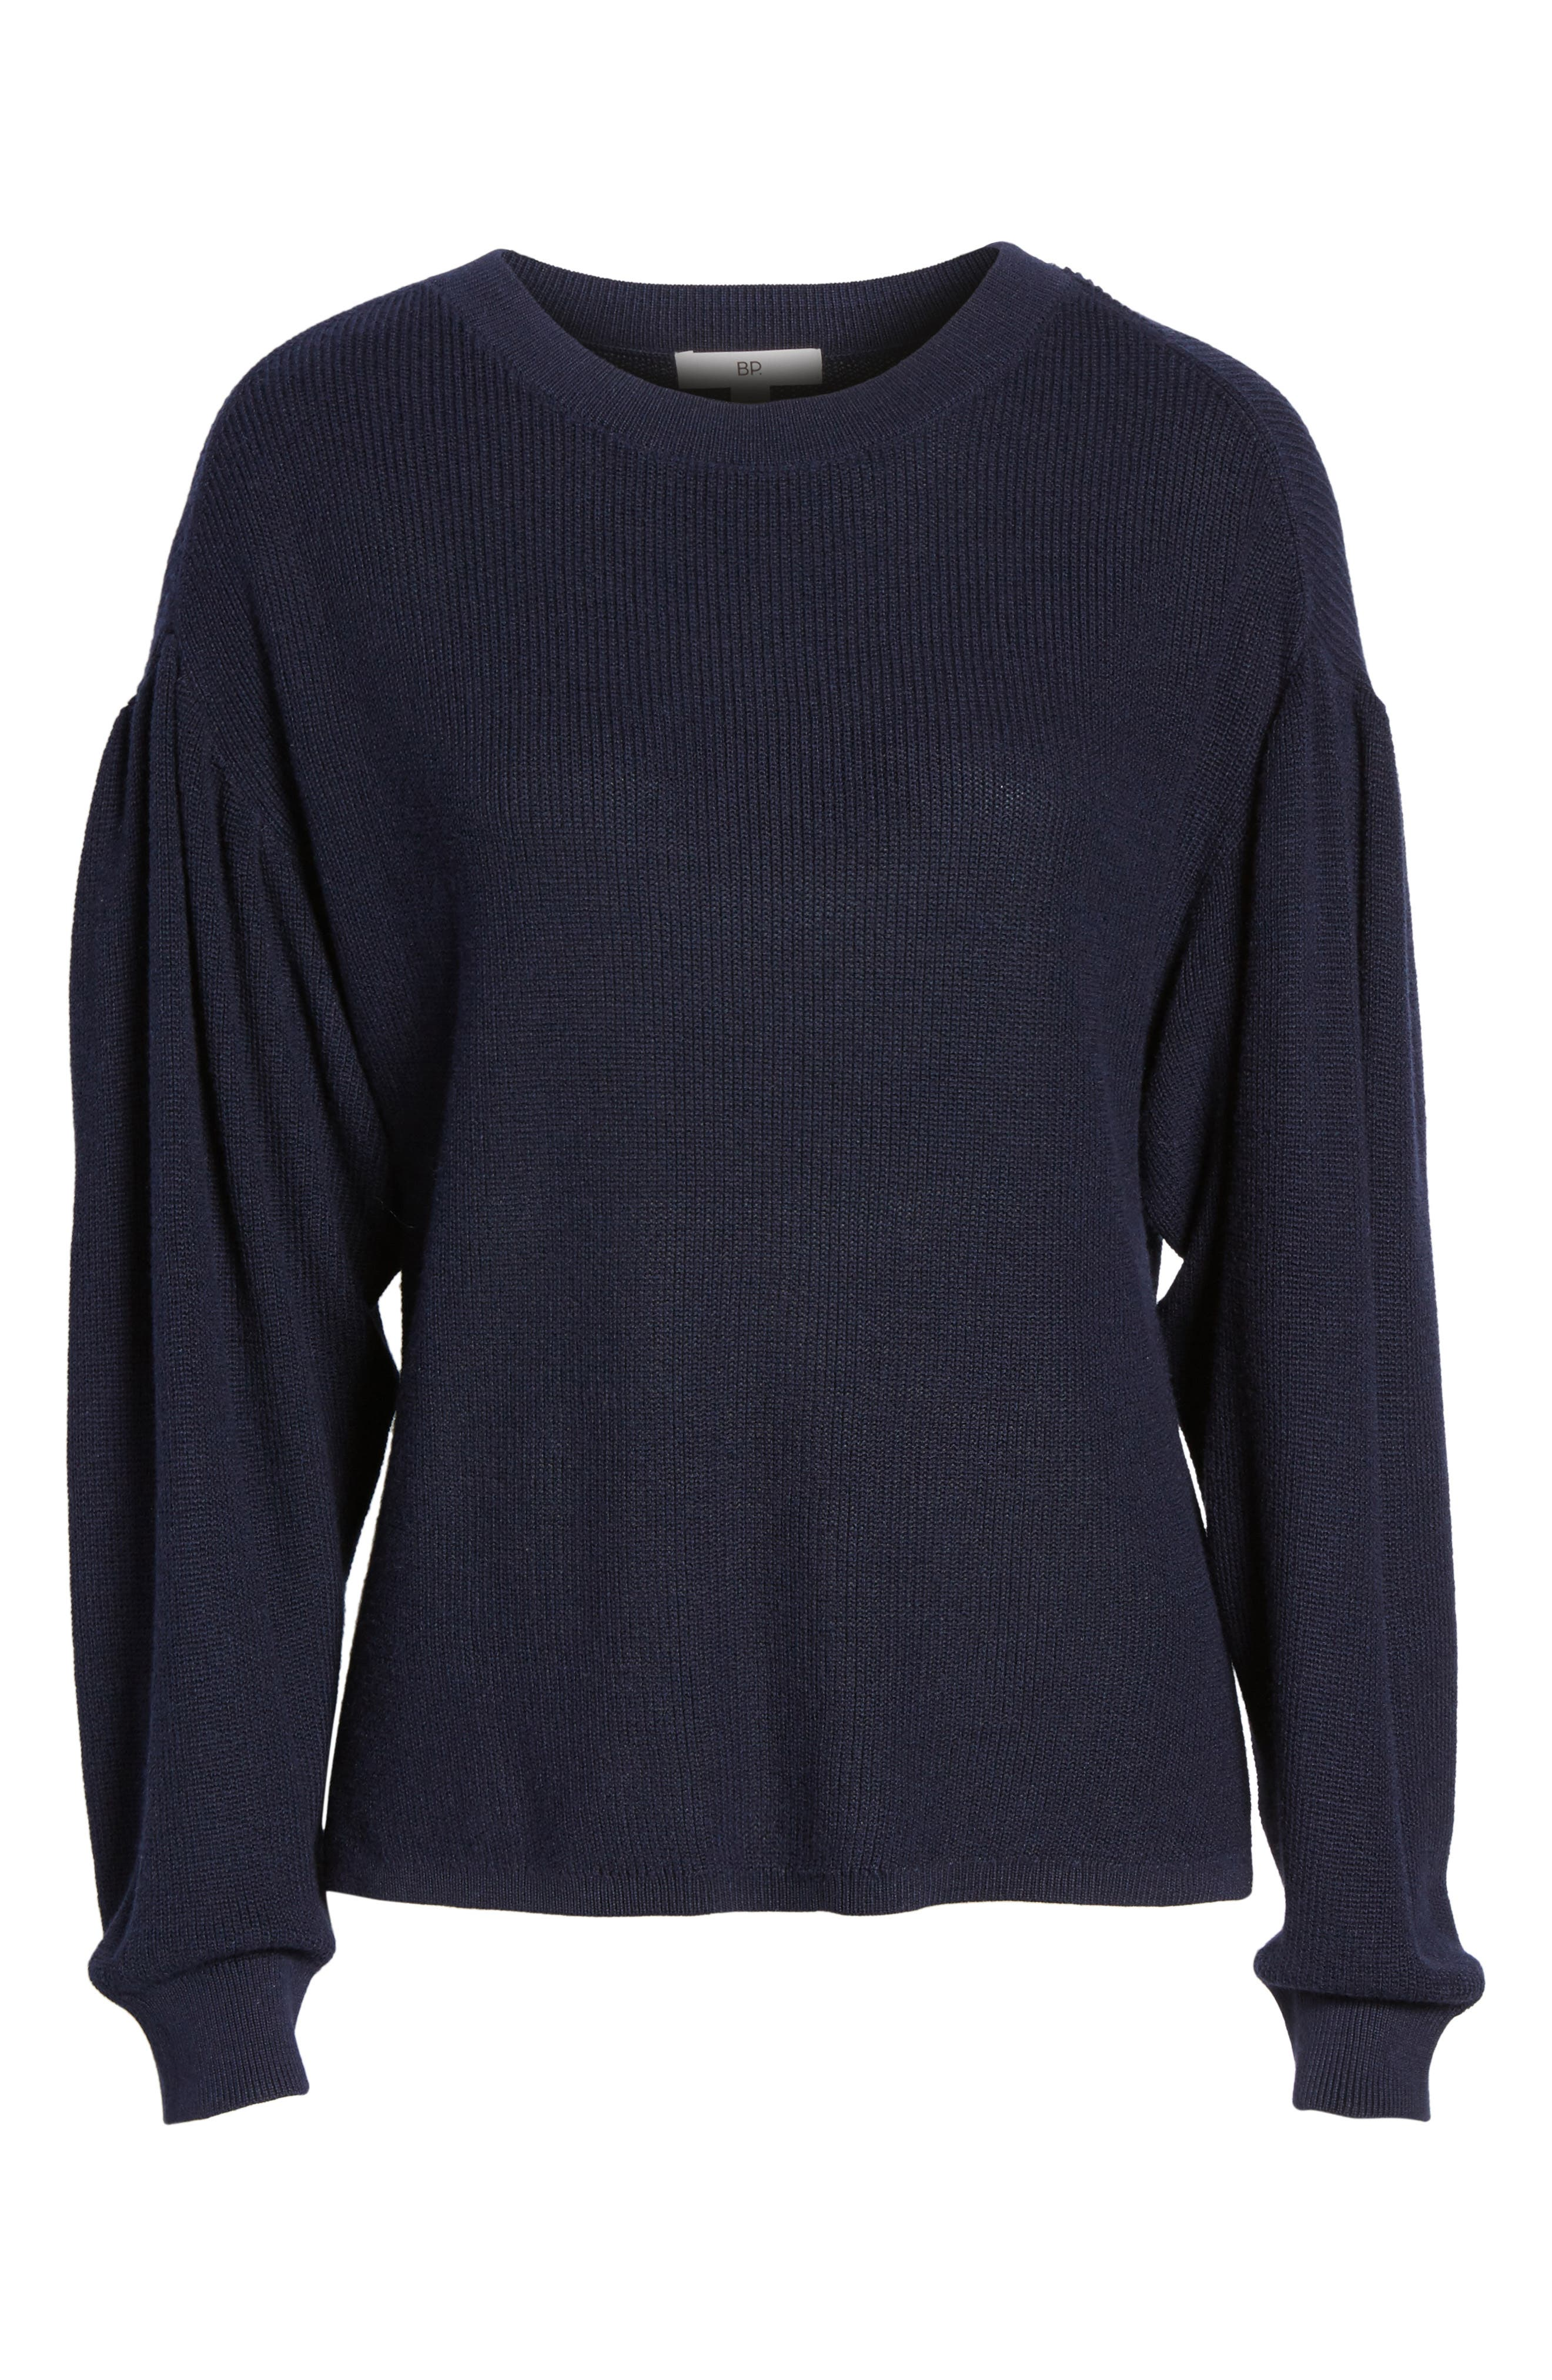 Drape Sleeve Sweater,                             Alternate thumbnail 6, color,                             Navy Evening